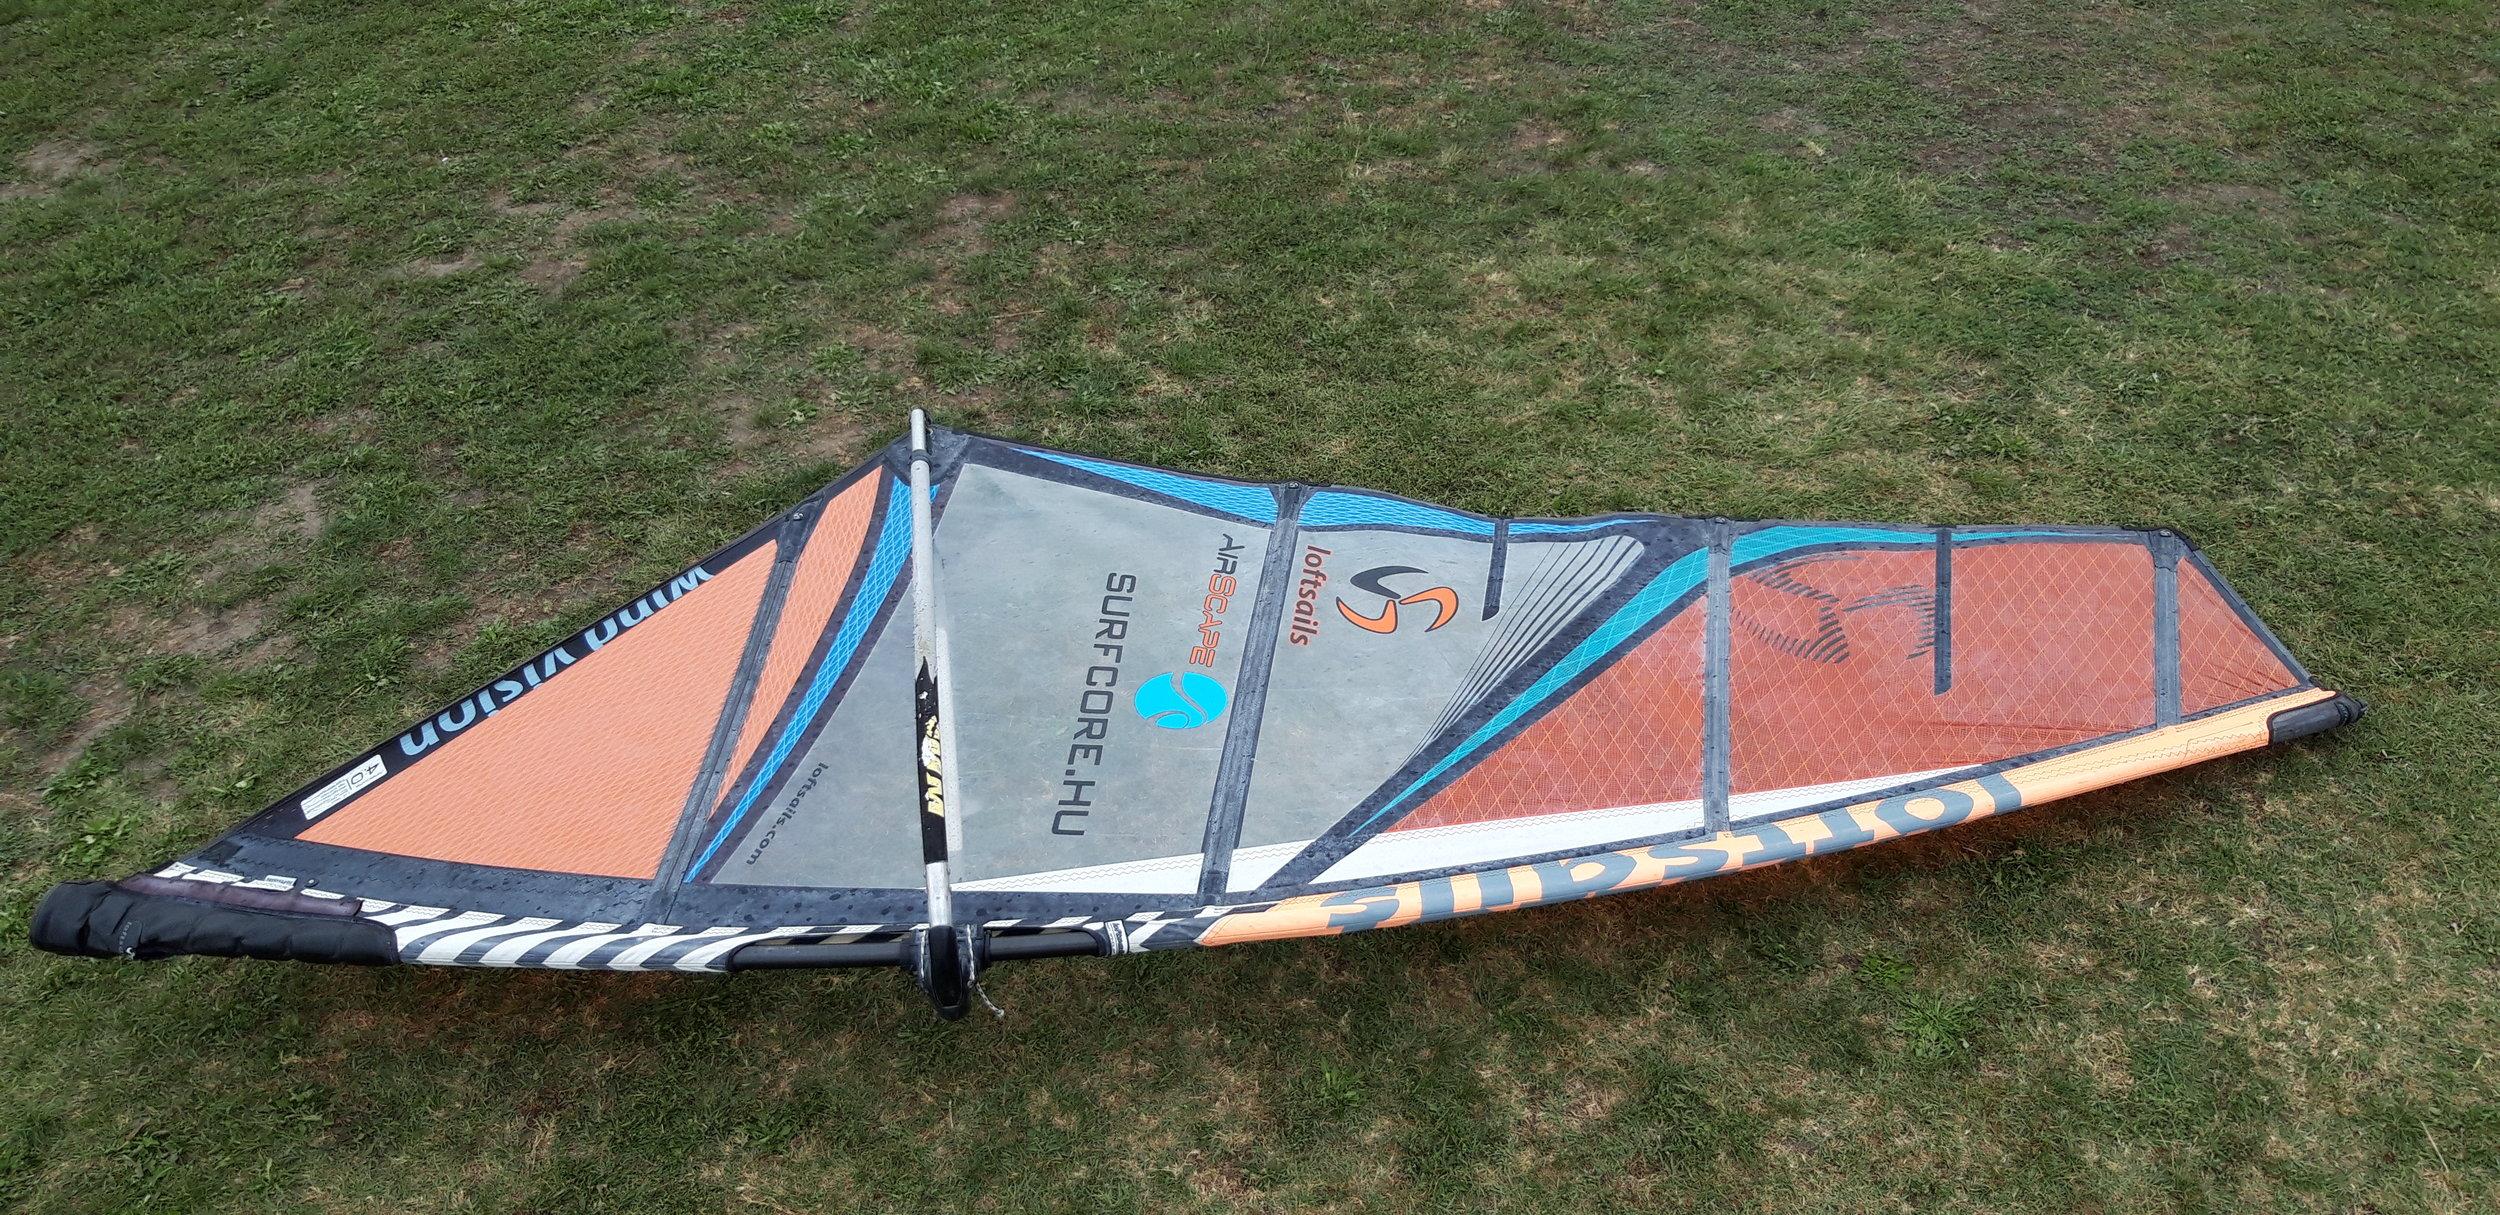 Loftsails airscape 4.0